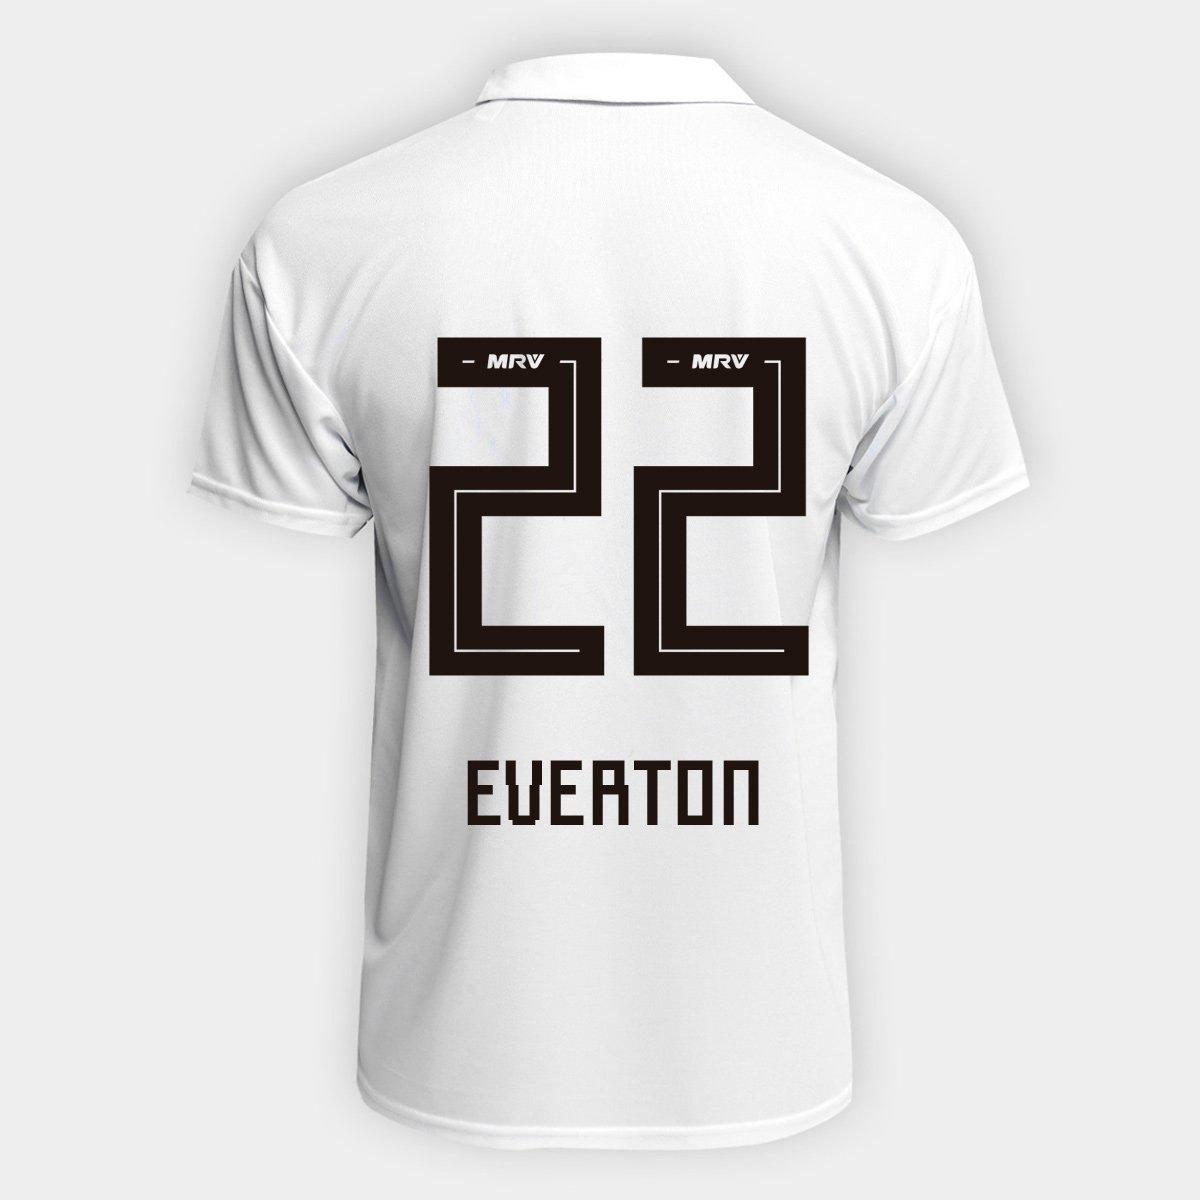 591946fc80ecf Camisa São Paulo I 2018 n° 22 Everton Torcedor Adidas Masculina | Netshoes